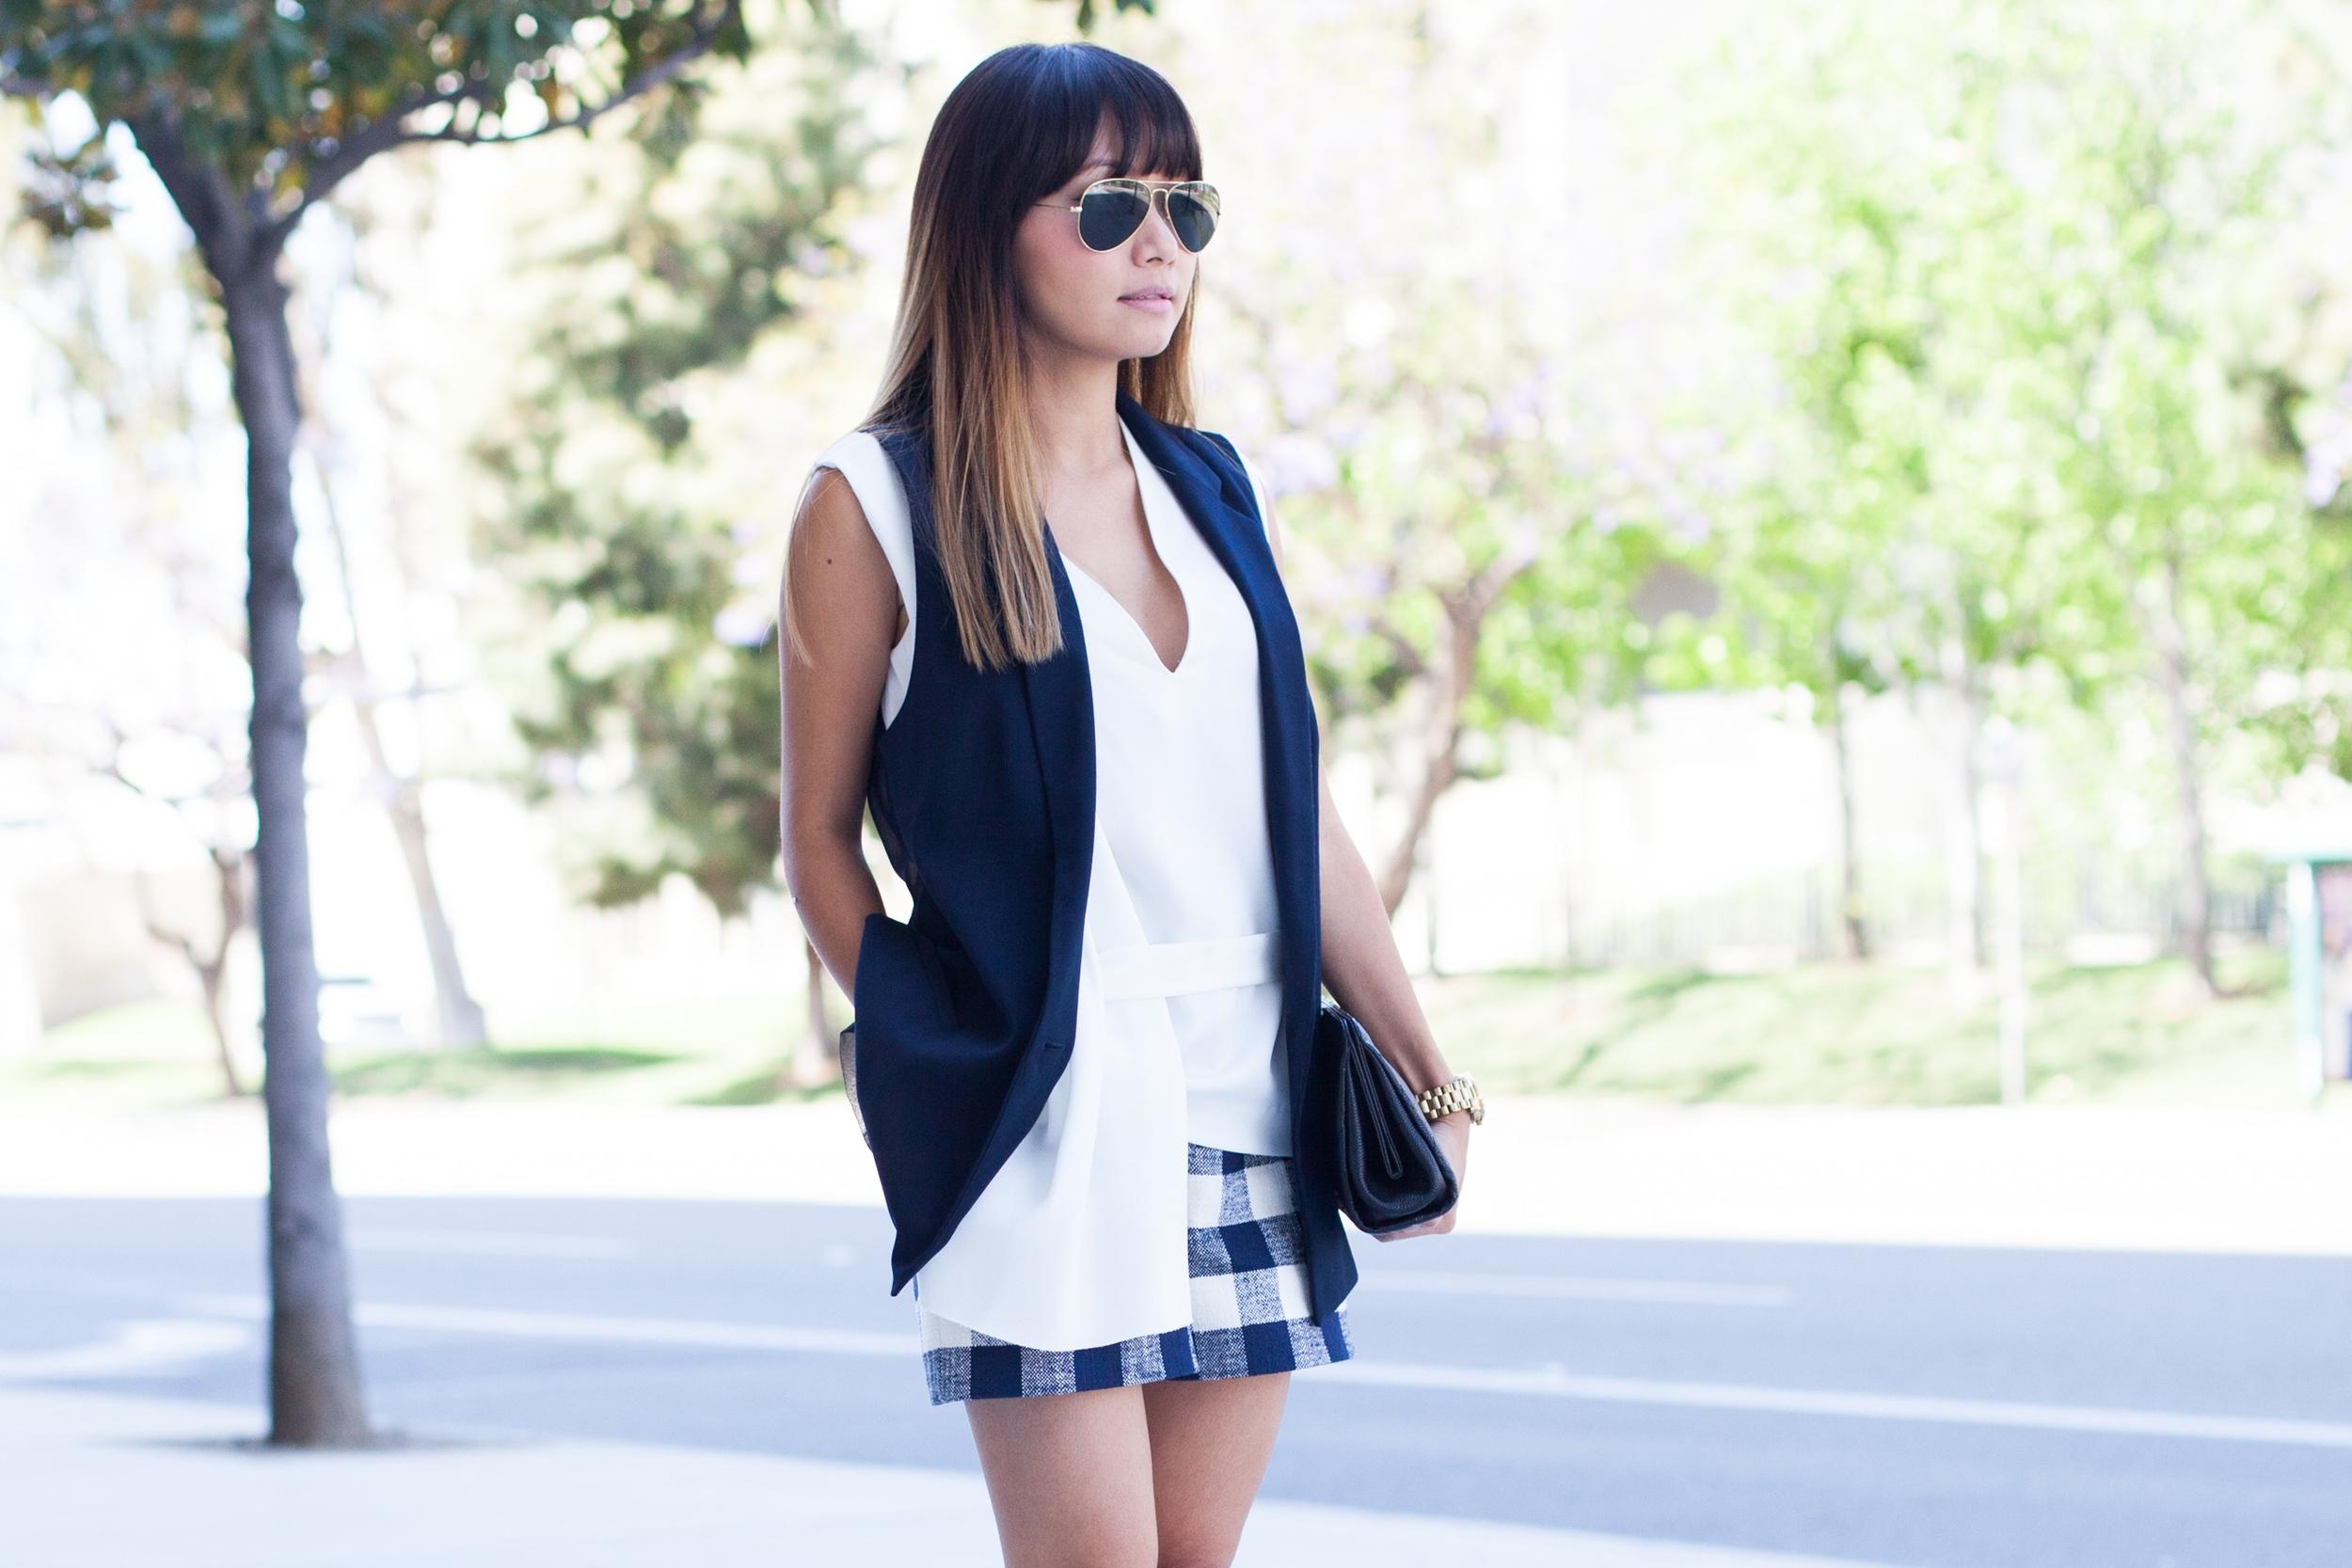 Checker Shorts (8 of 10)